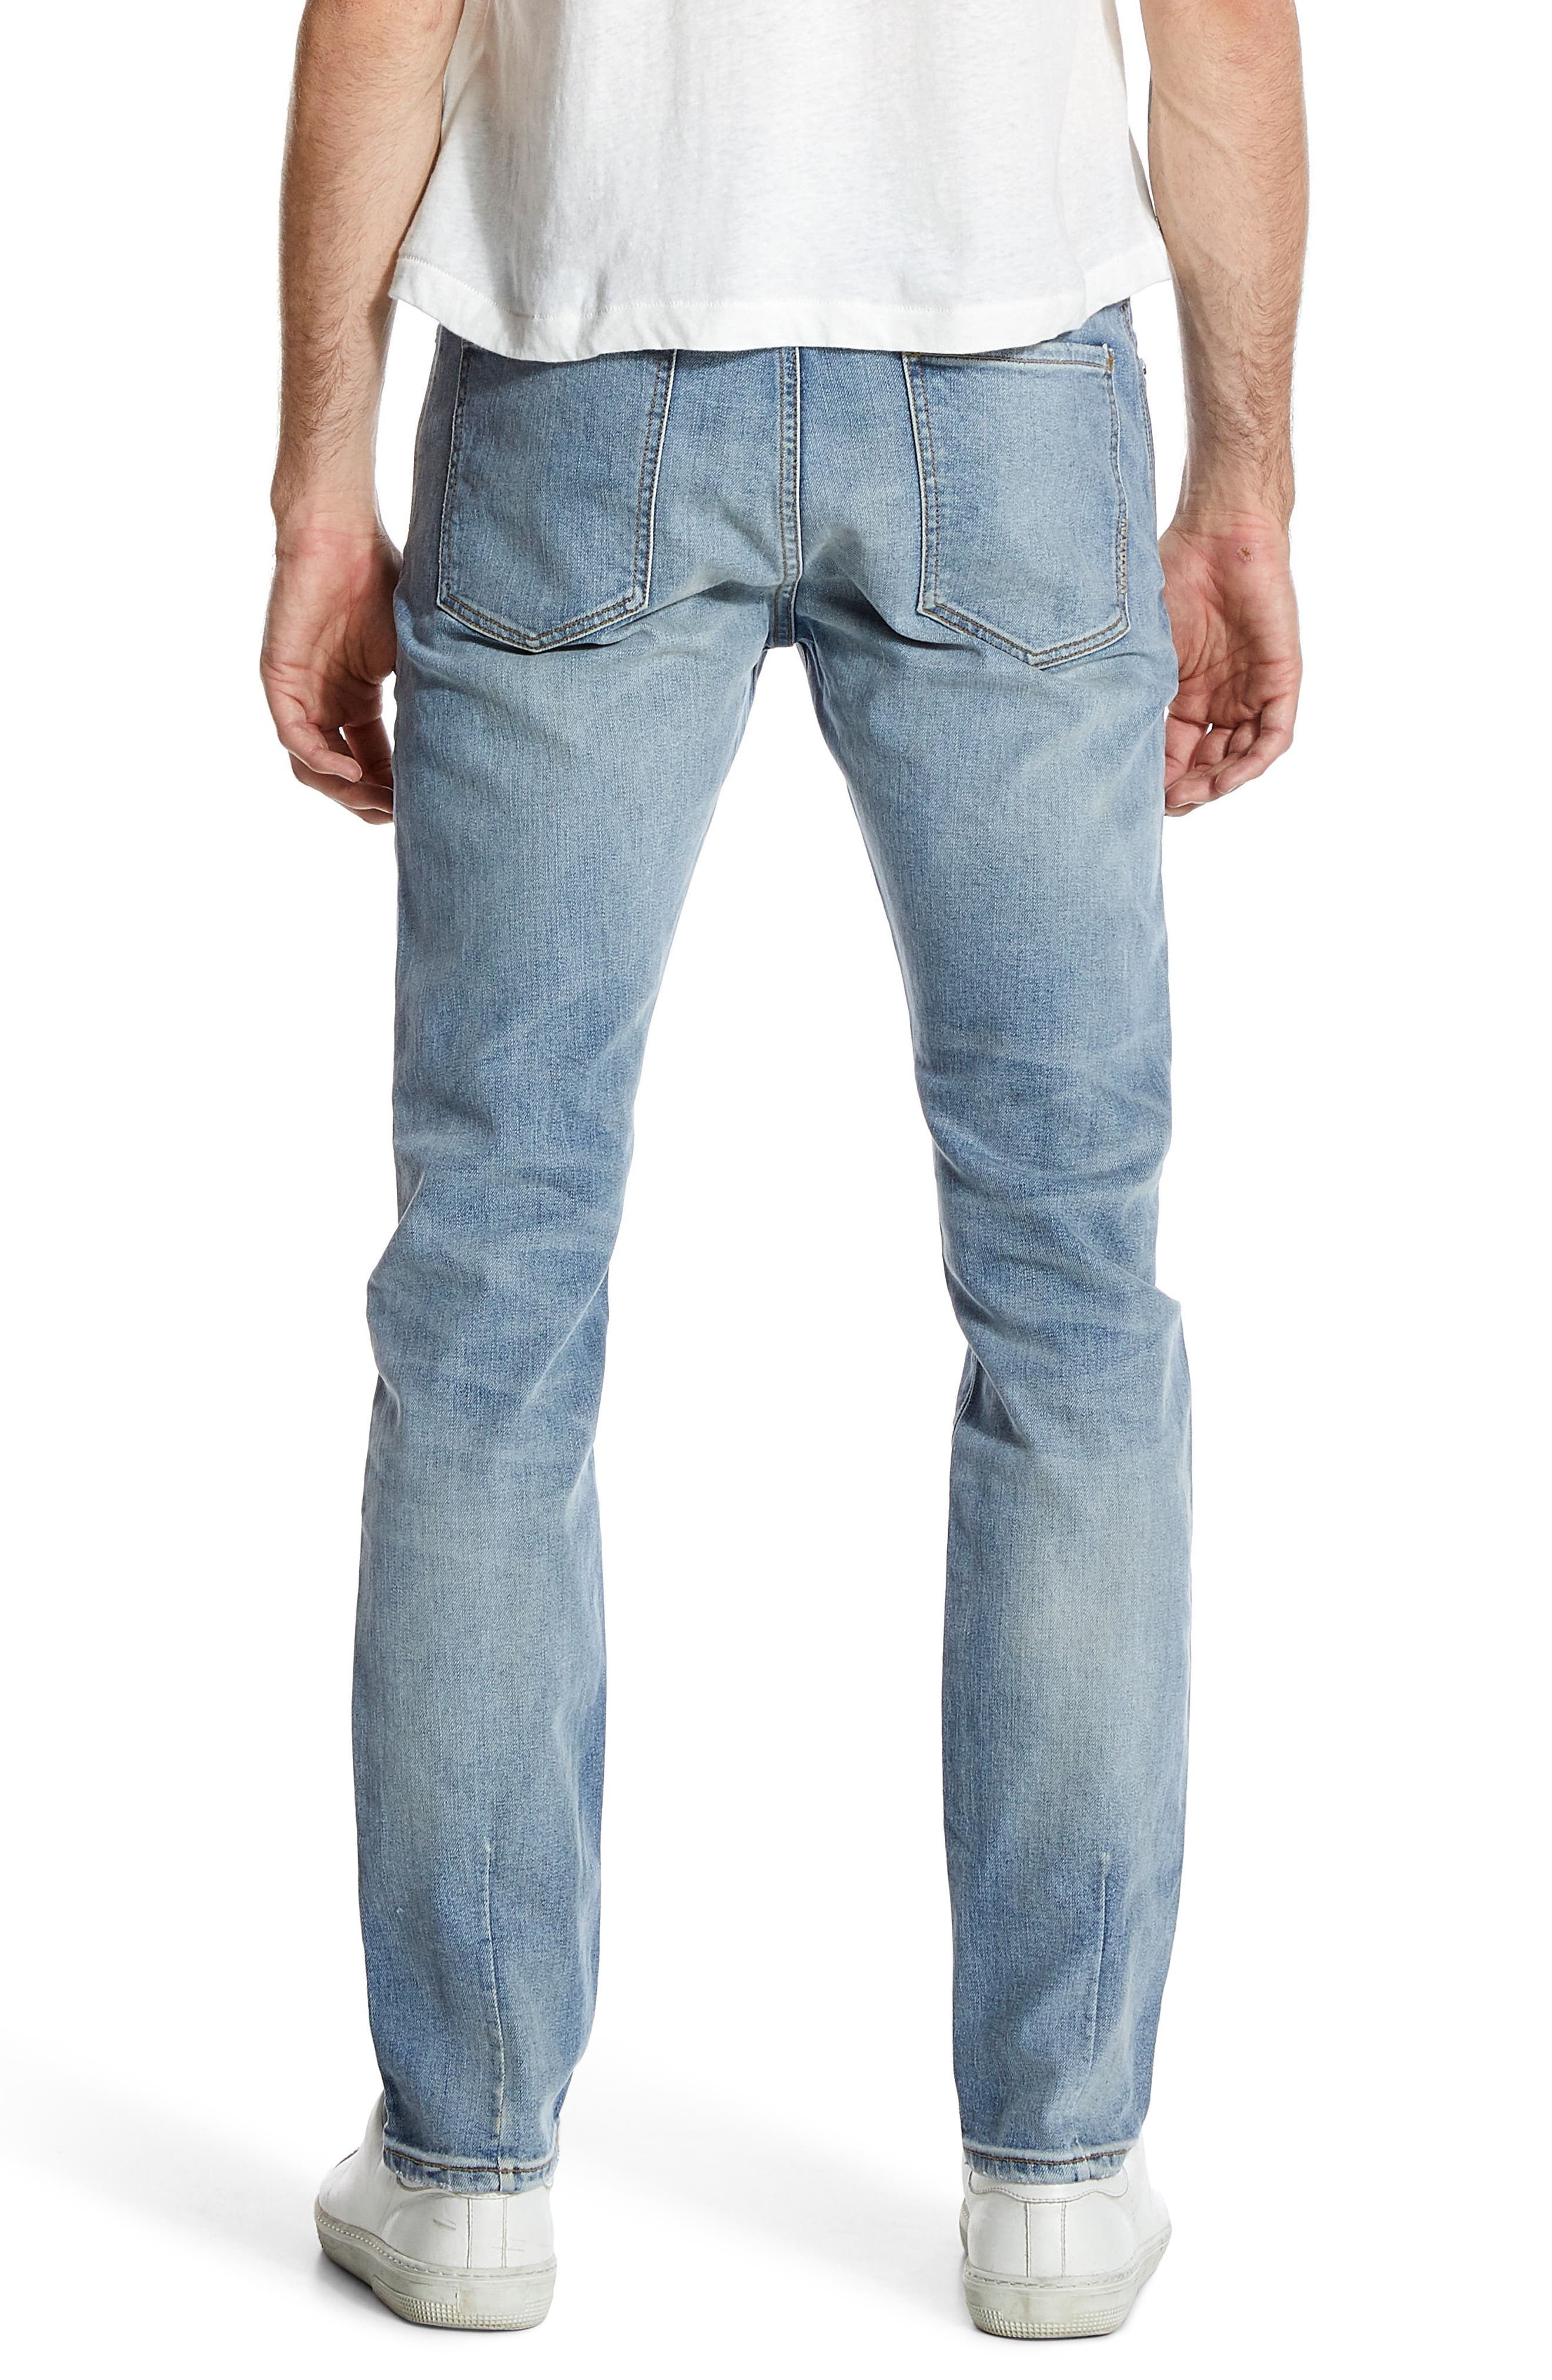 Iggy Skinny Fit Jeans,                             Alternate thumbnail 2, color,                             Atomic Airwash